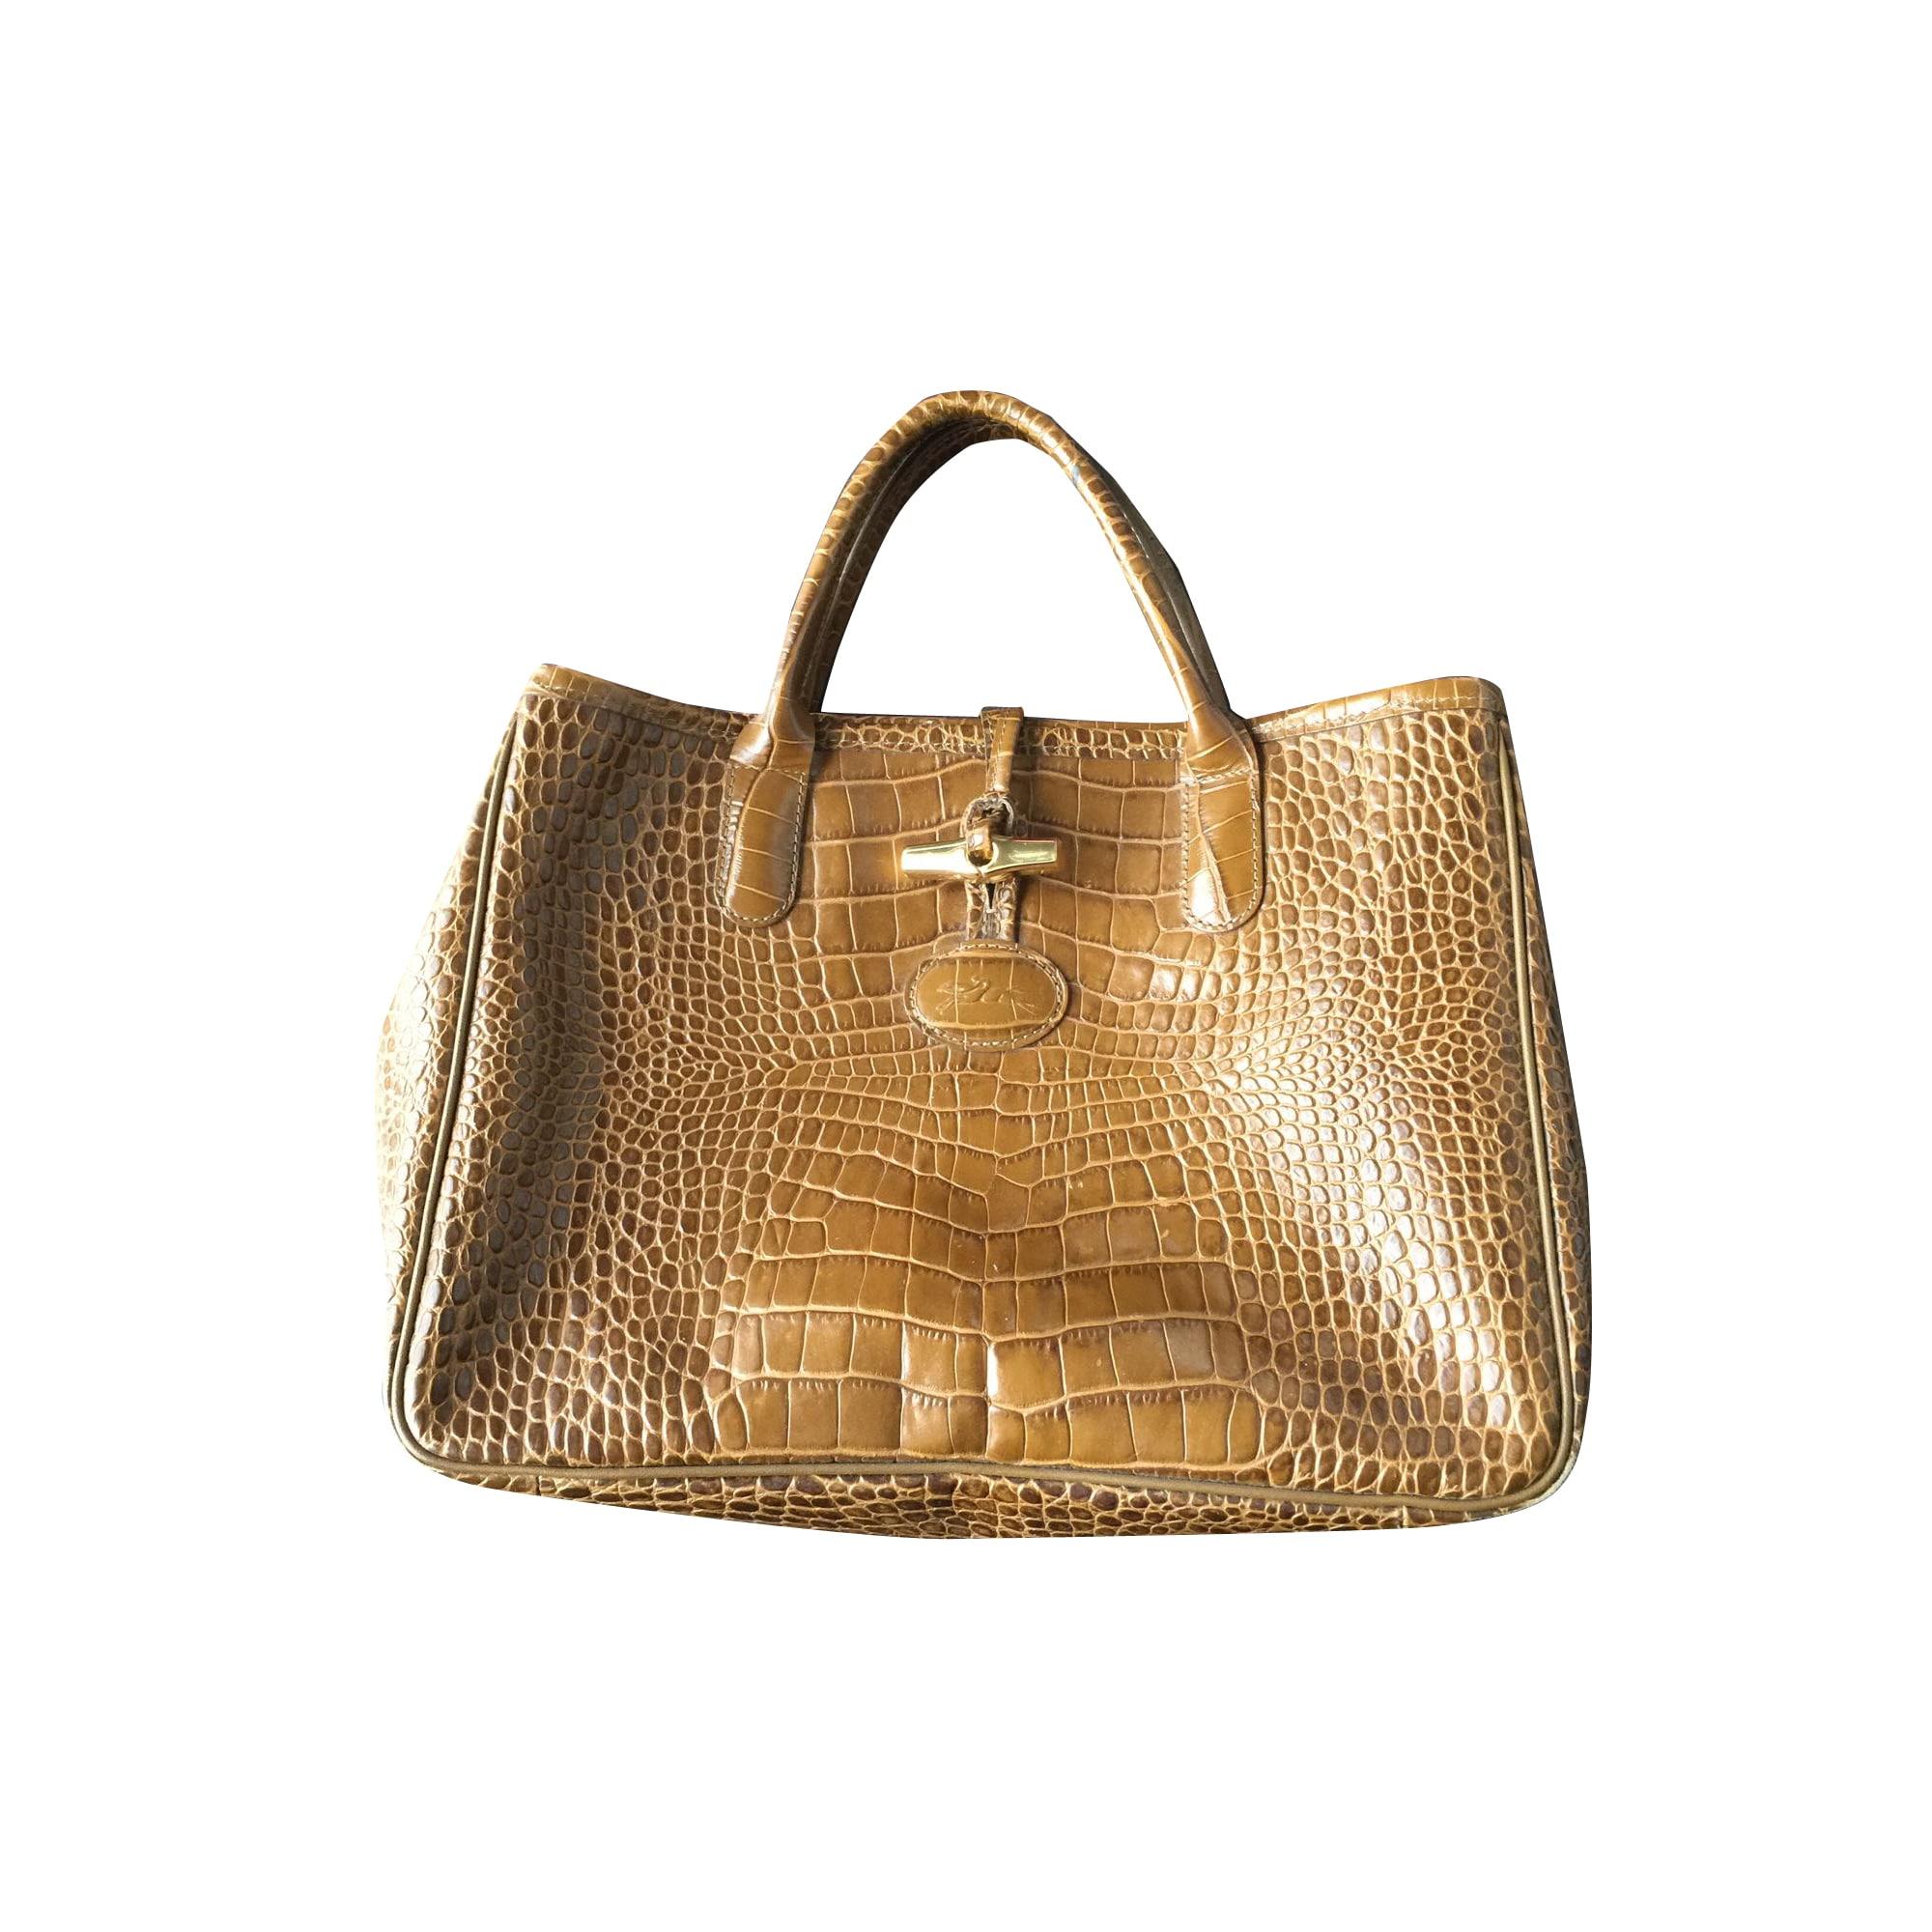 vuoto venduta Longchamp marrone pelle Dressing in Borsa De sotto TxqqIw4Y1